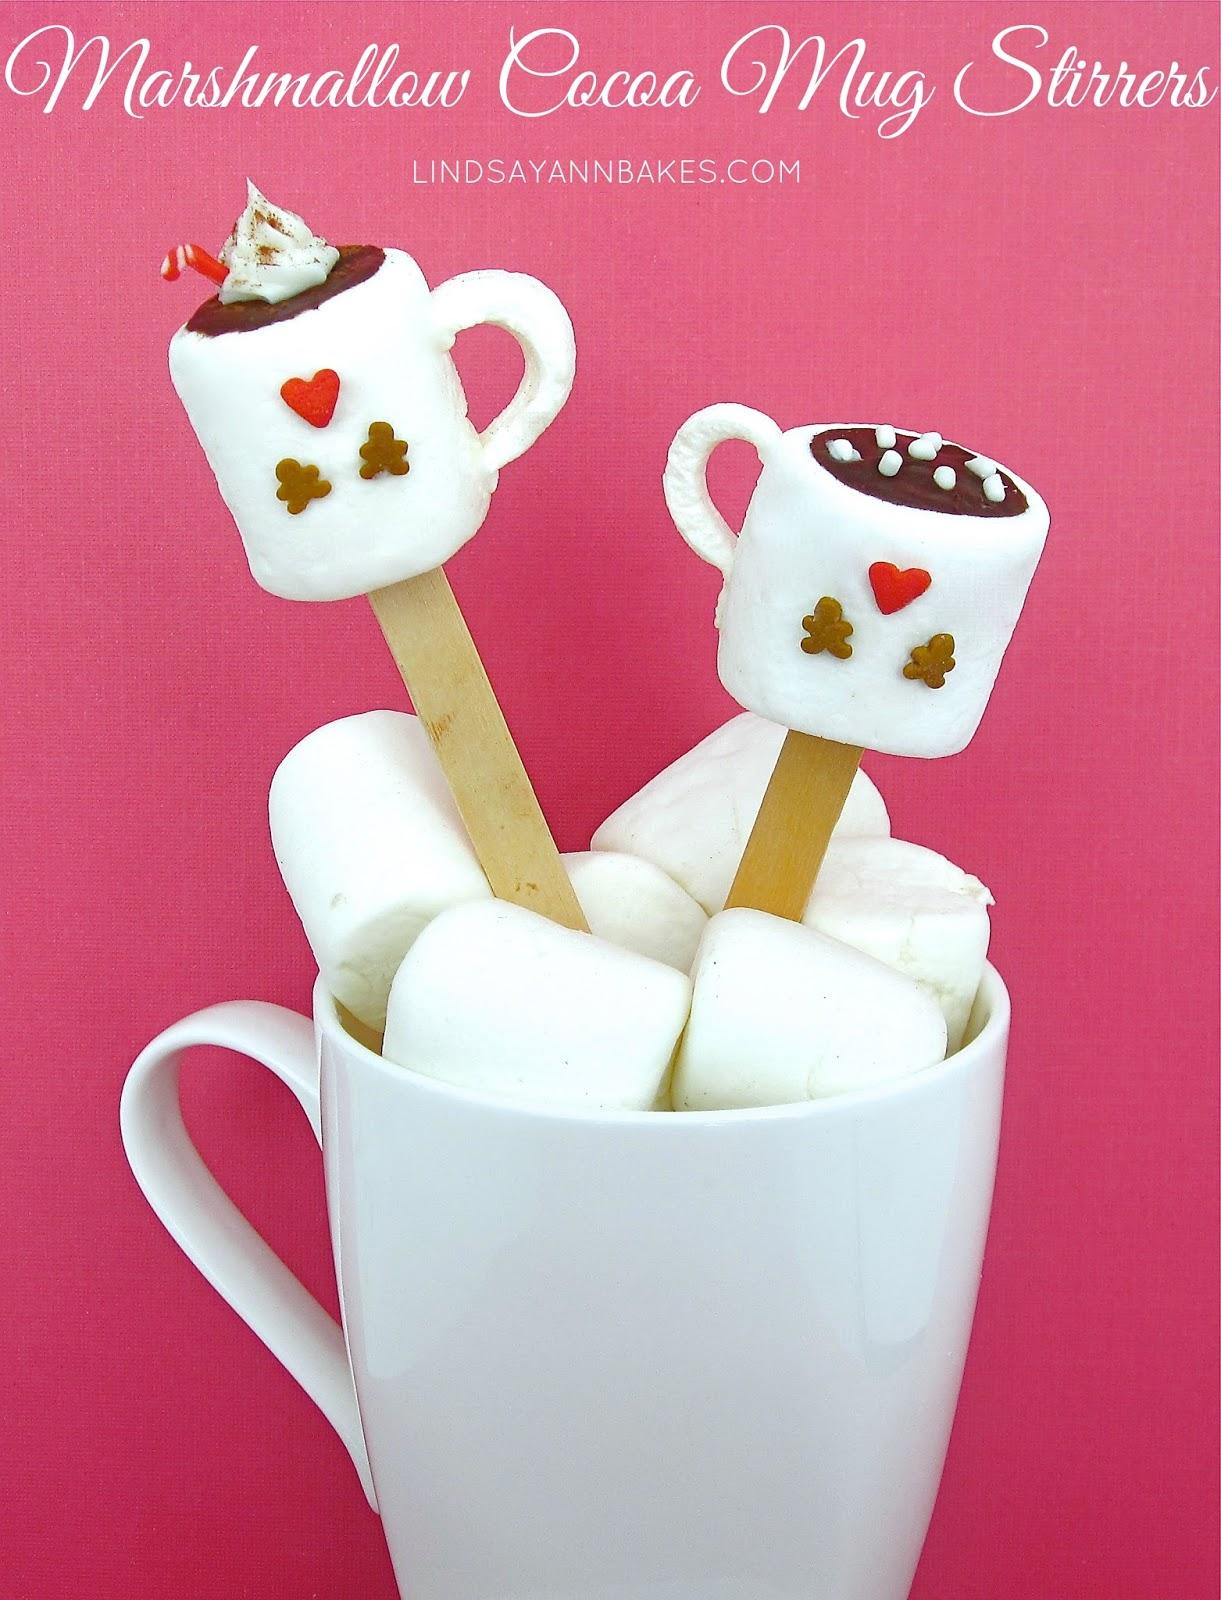 Chocolate Marshmallow Cake In A Mug